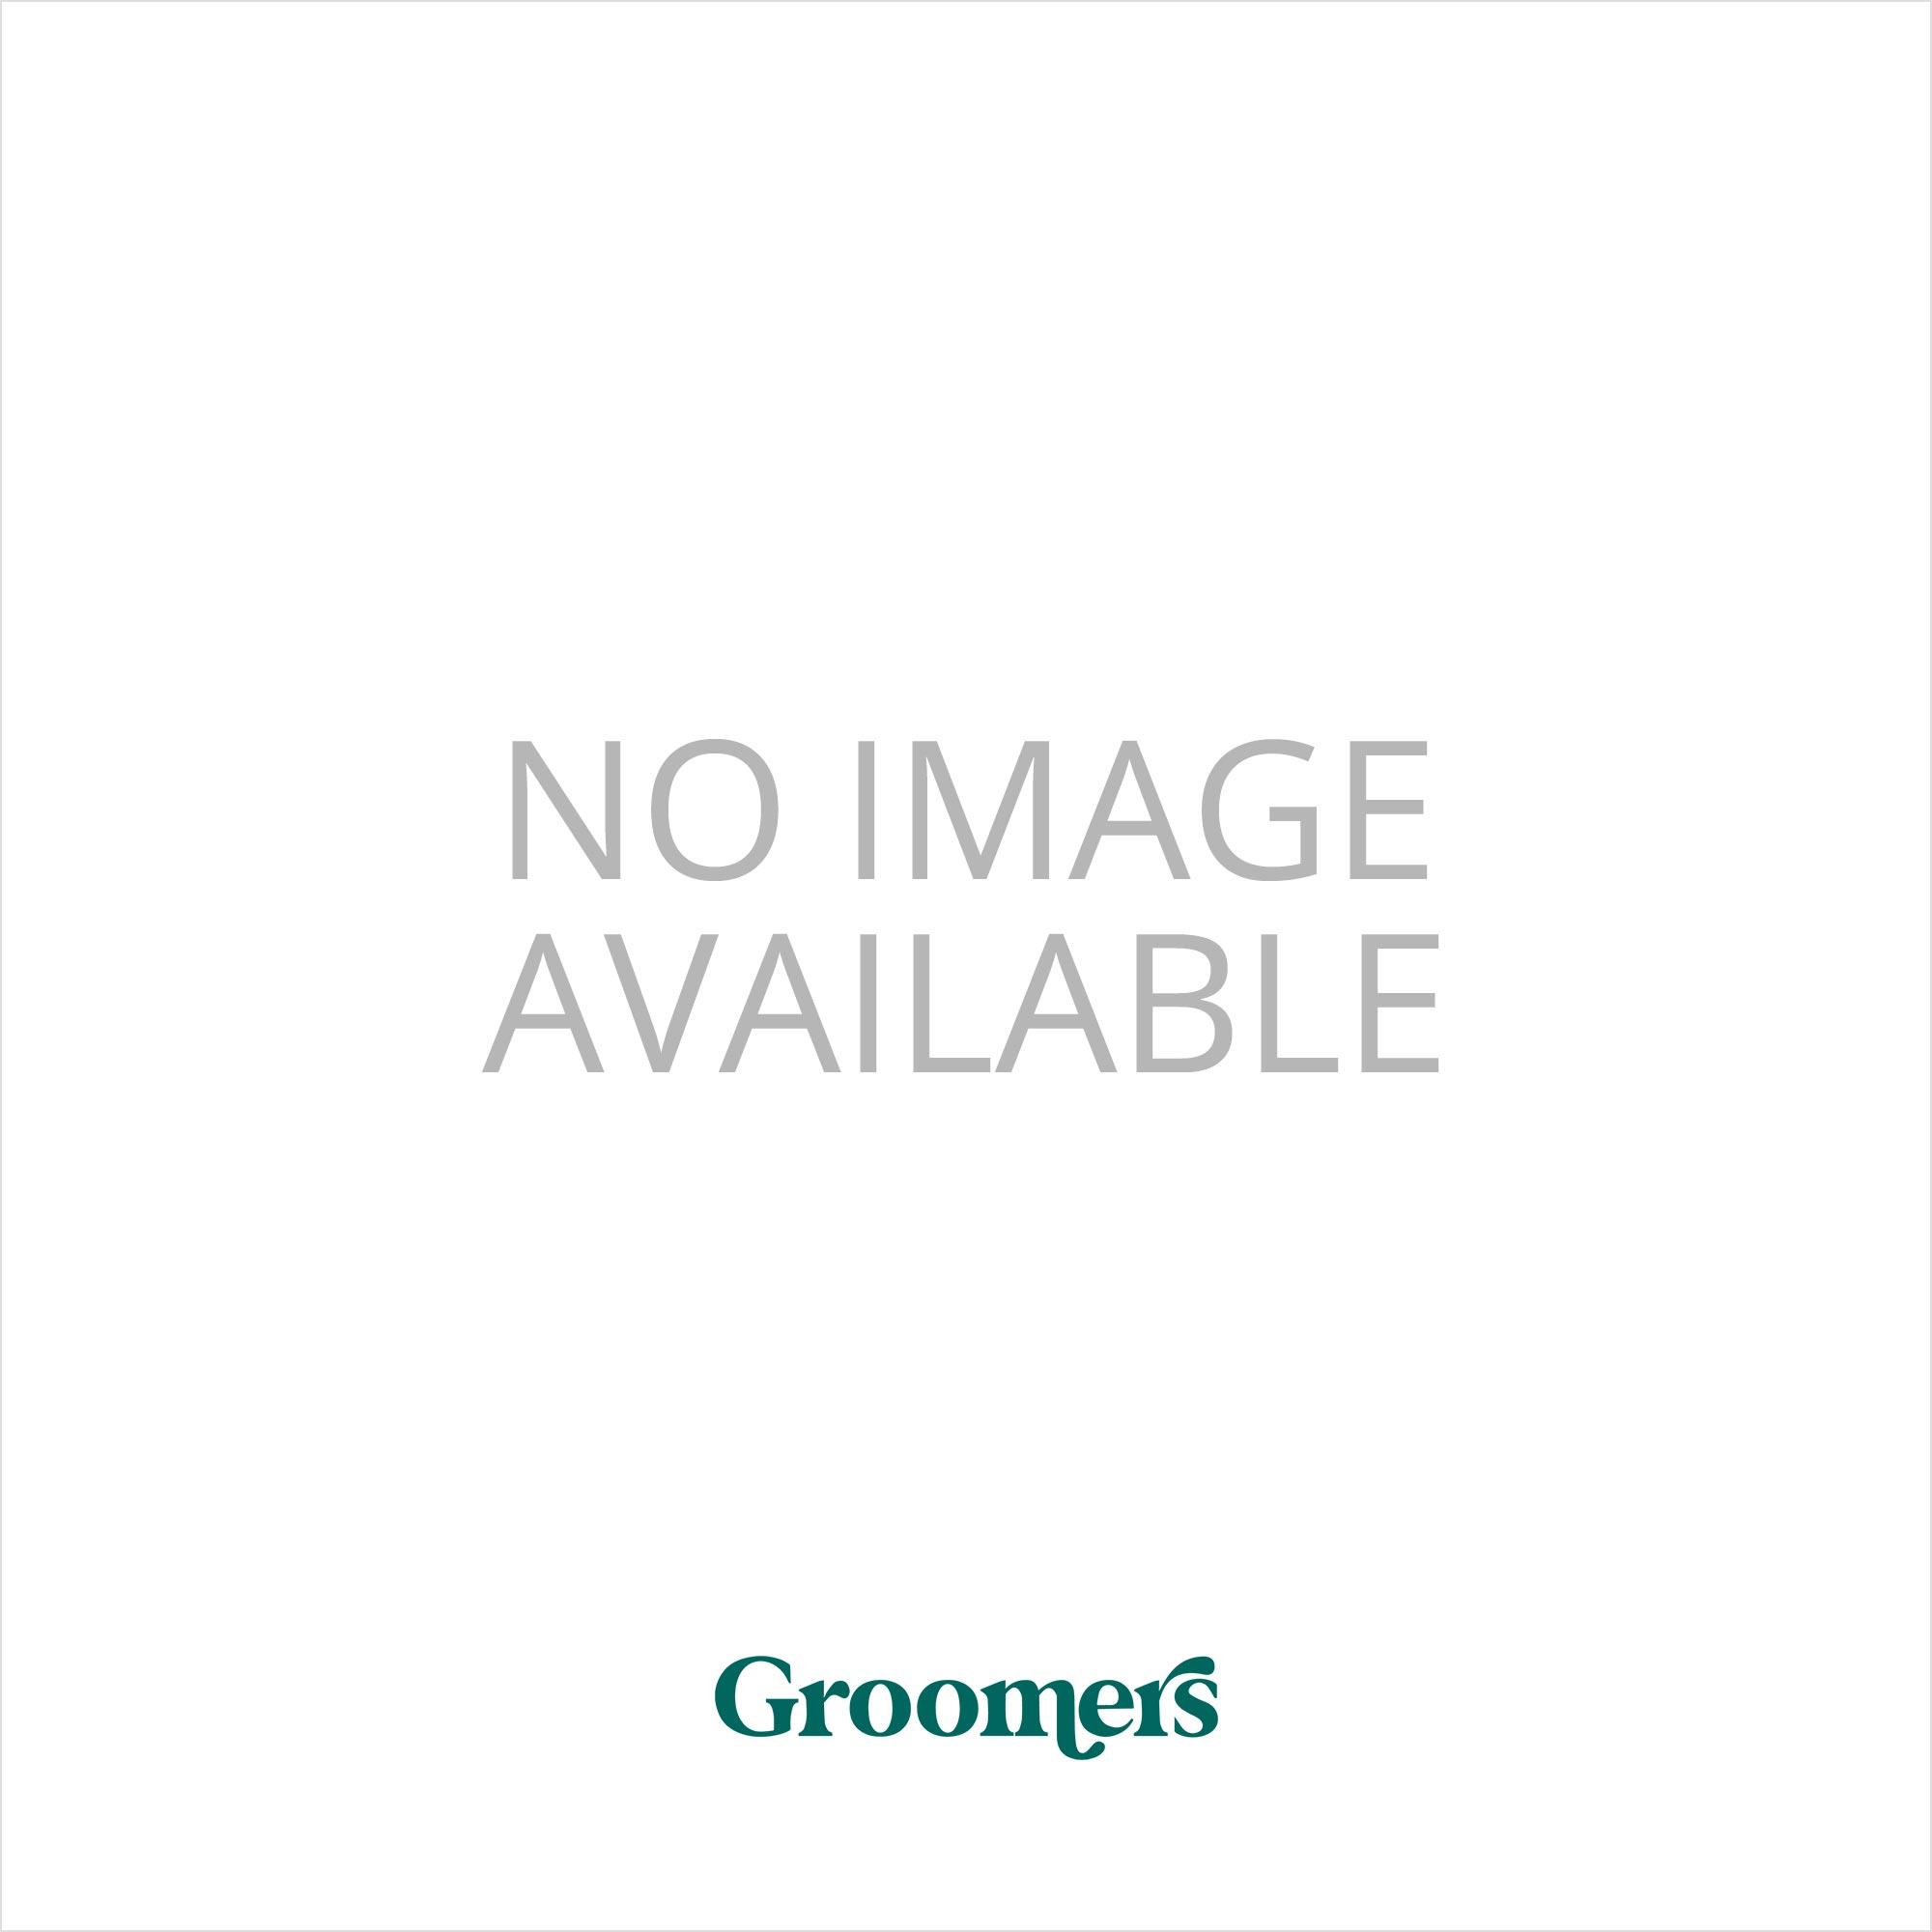 Groomers Metro II ExLo Electric Table – Black Frame, Purple Table Top - NEW